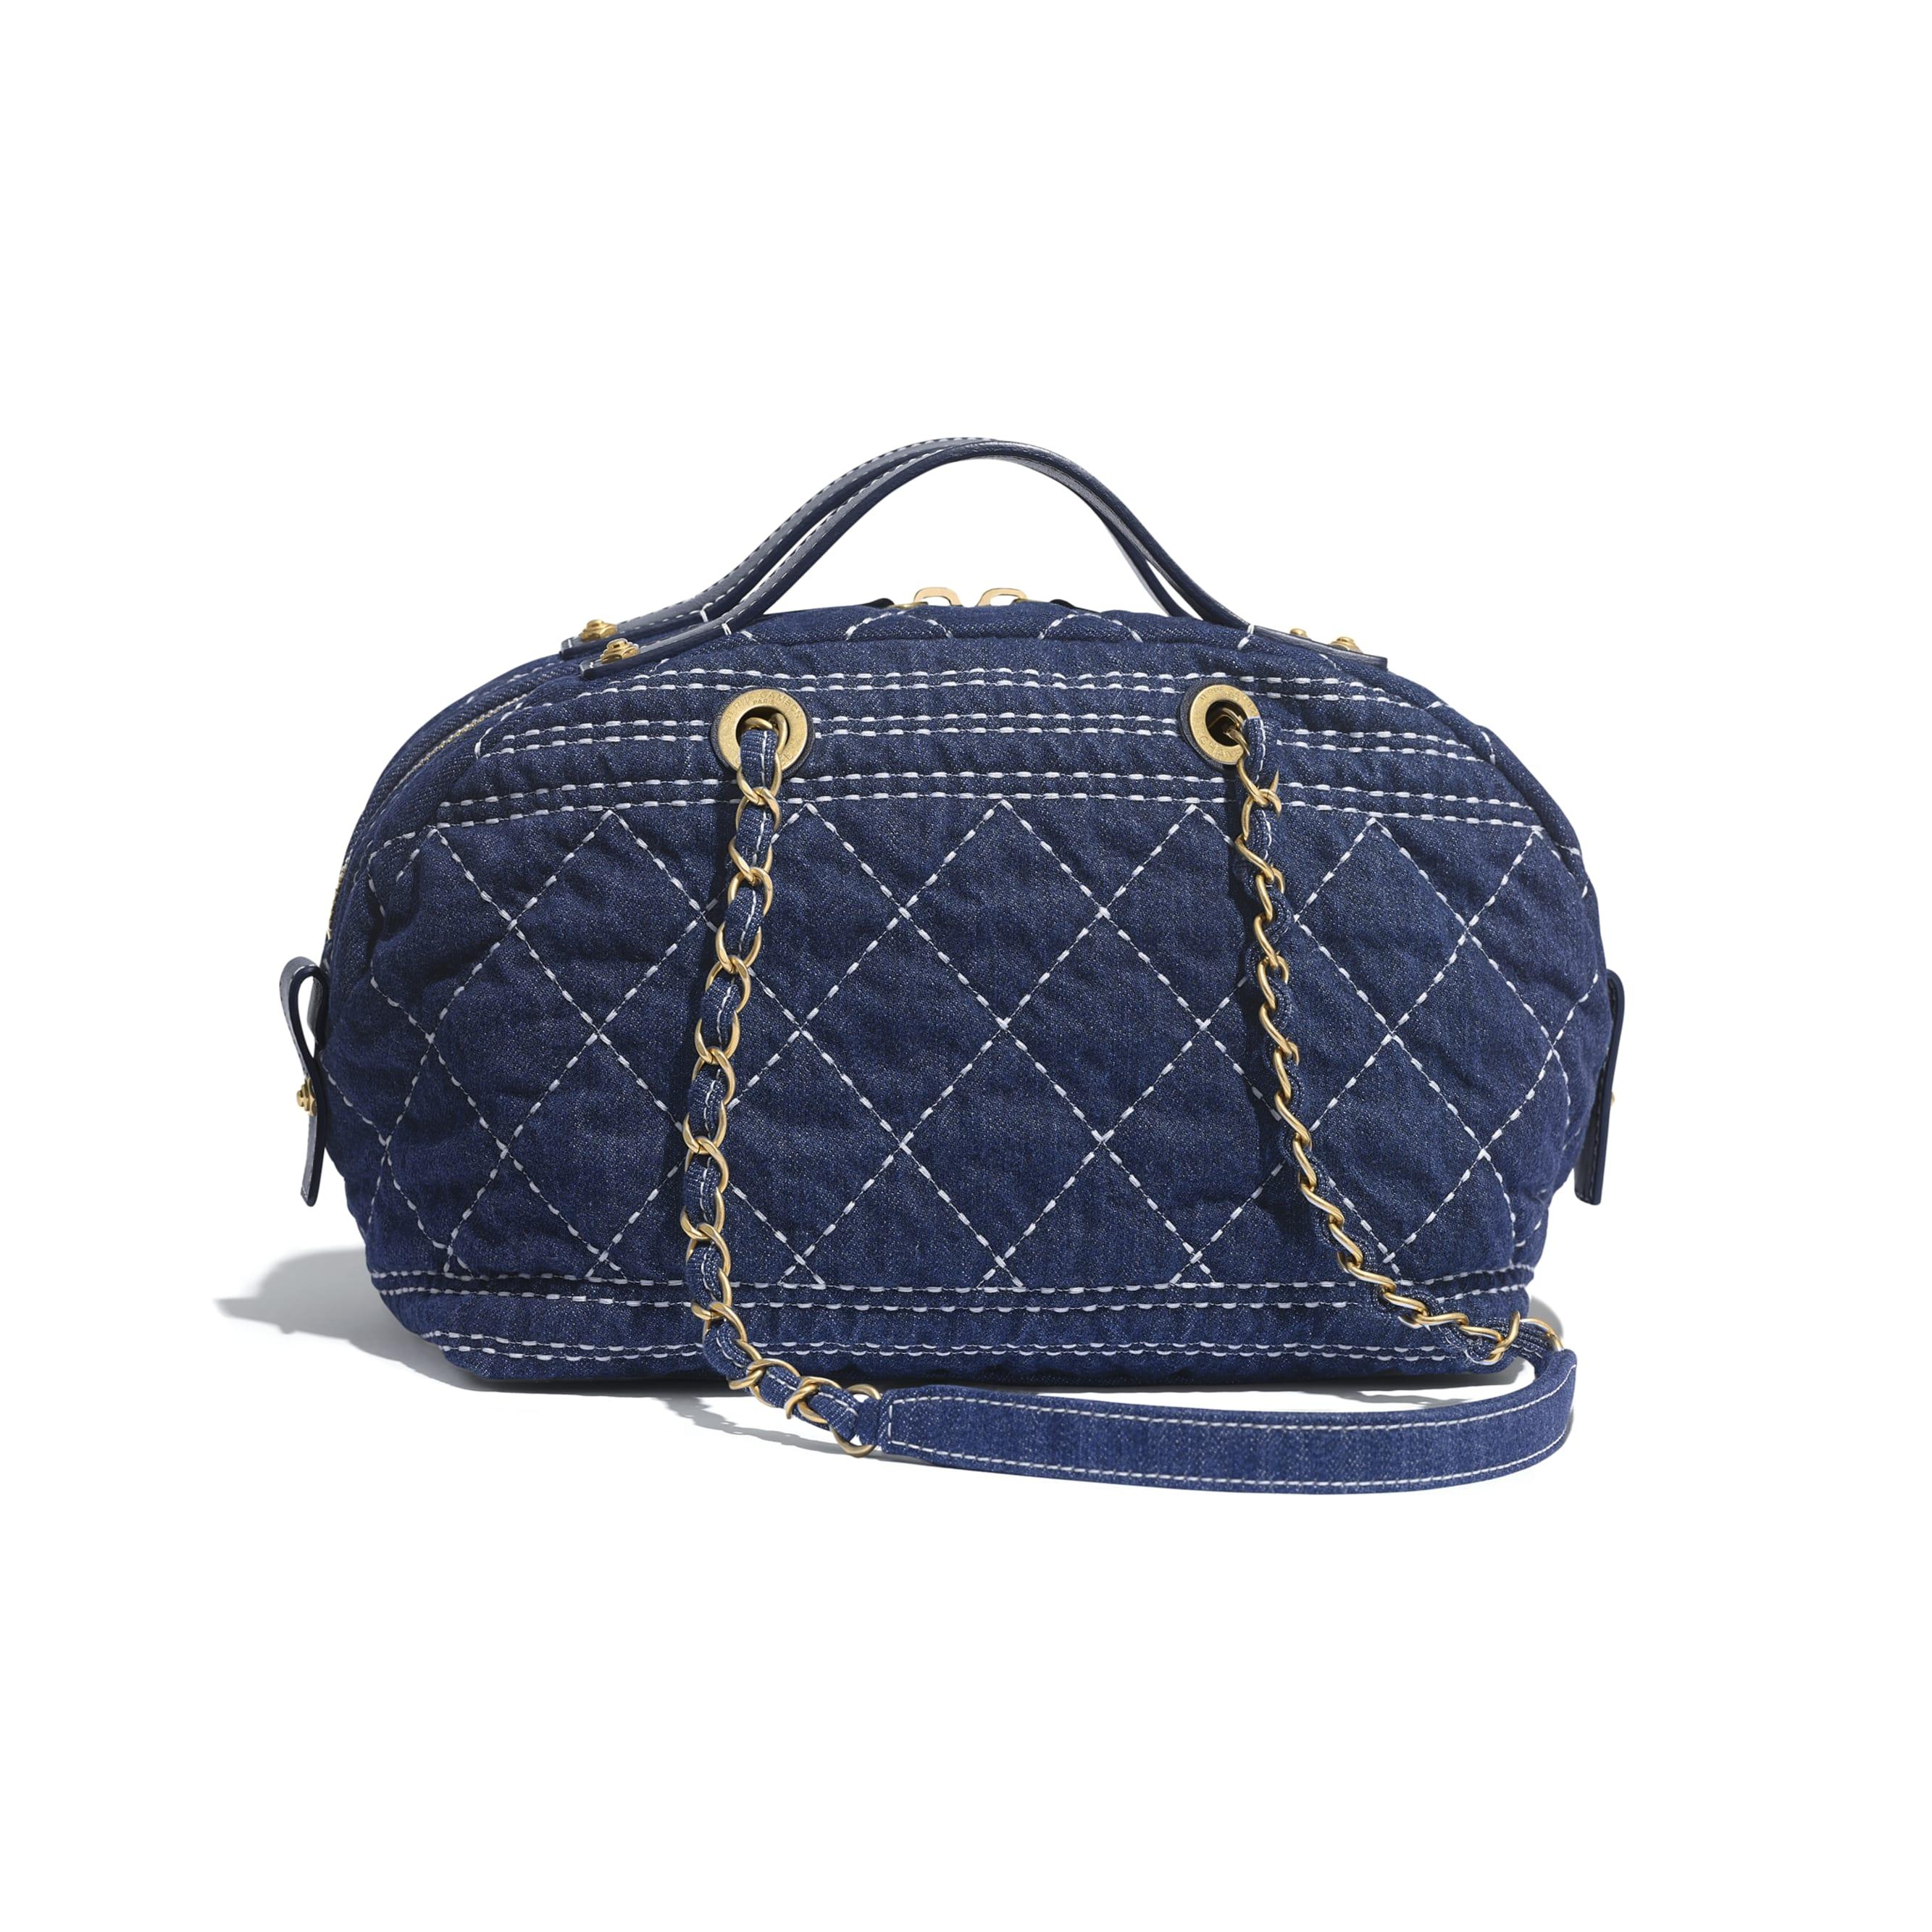 Bowling Bag - Blue - Denim & Gold-Tone Metal - CHANEL - Alternative view - see standard sized version